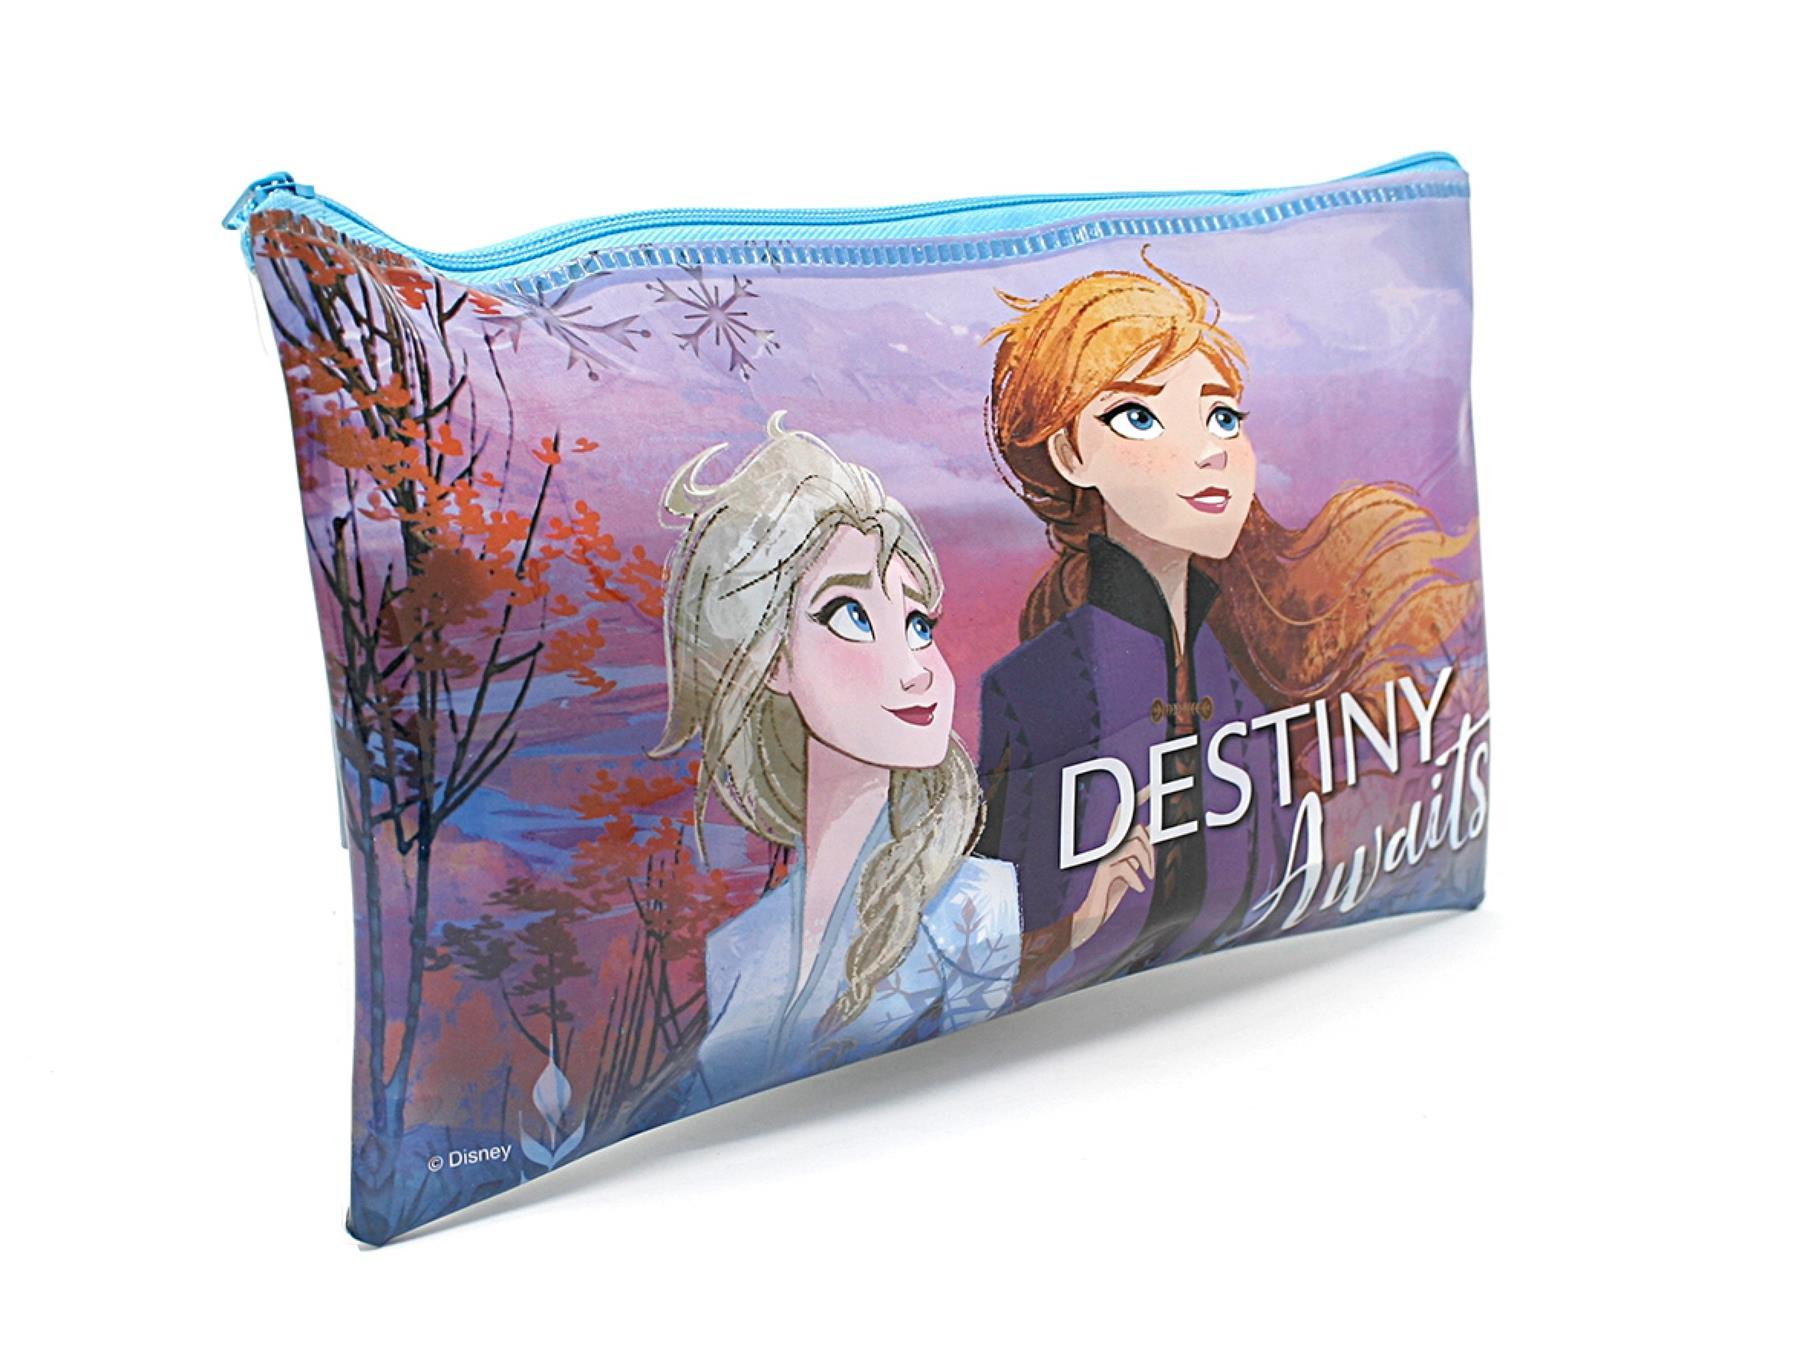 thumbnail 9 - Disney Frozen 2 Elsa Stationary Gift Set Case Chest Pencil Case Stocking Filler